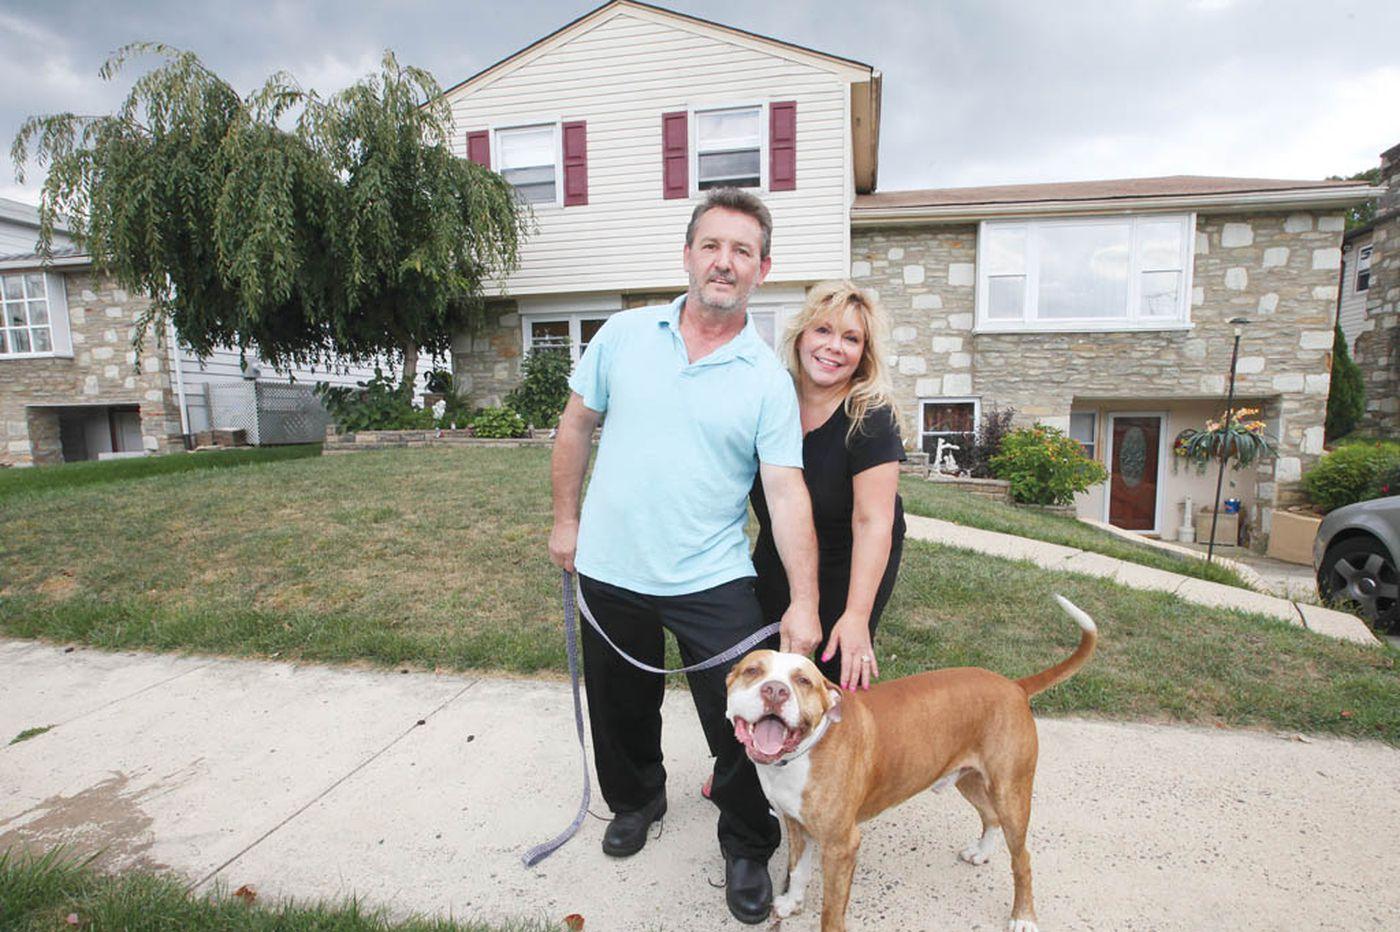 Should parents lose house when son sells drugs?